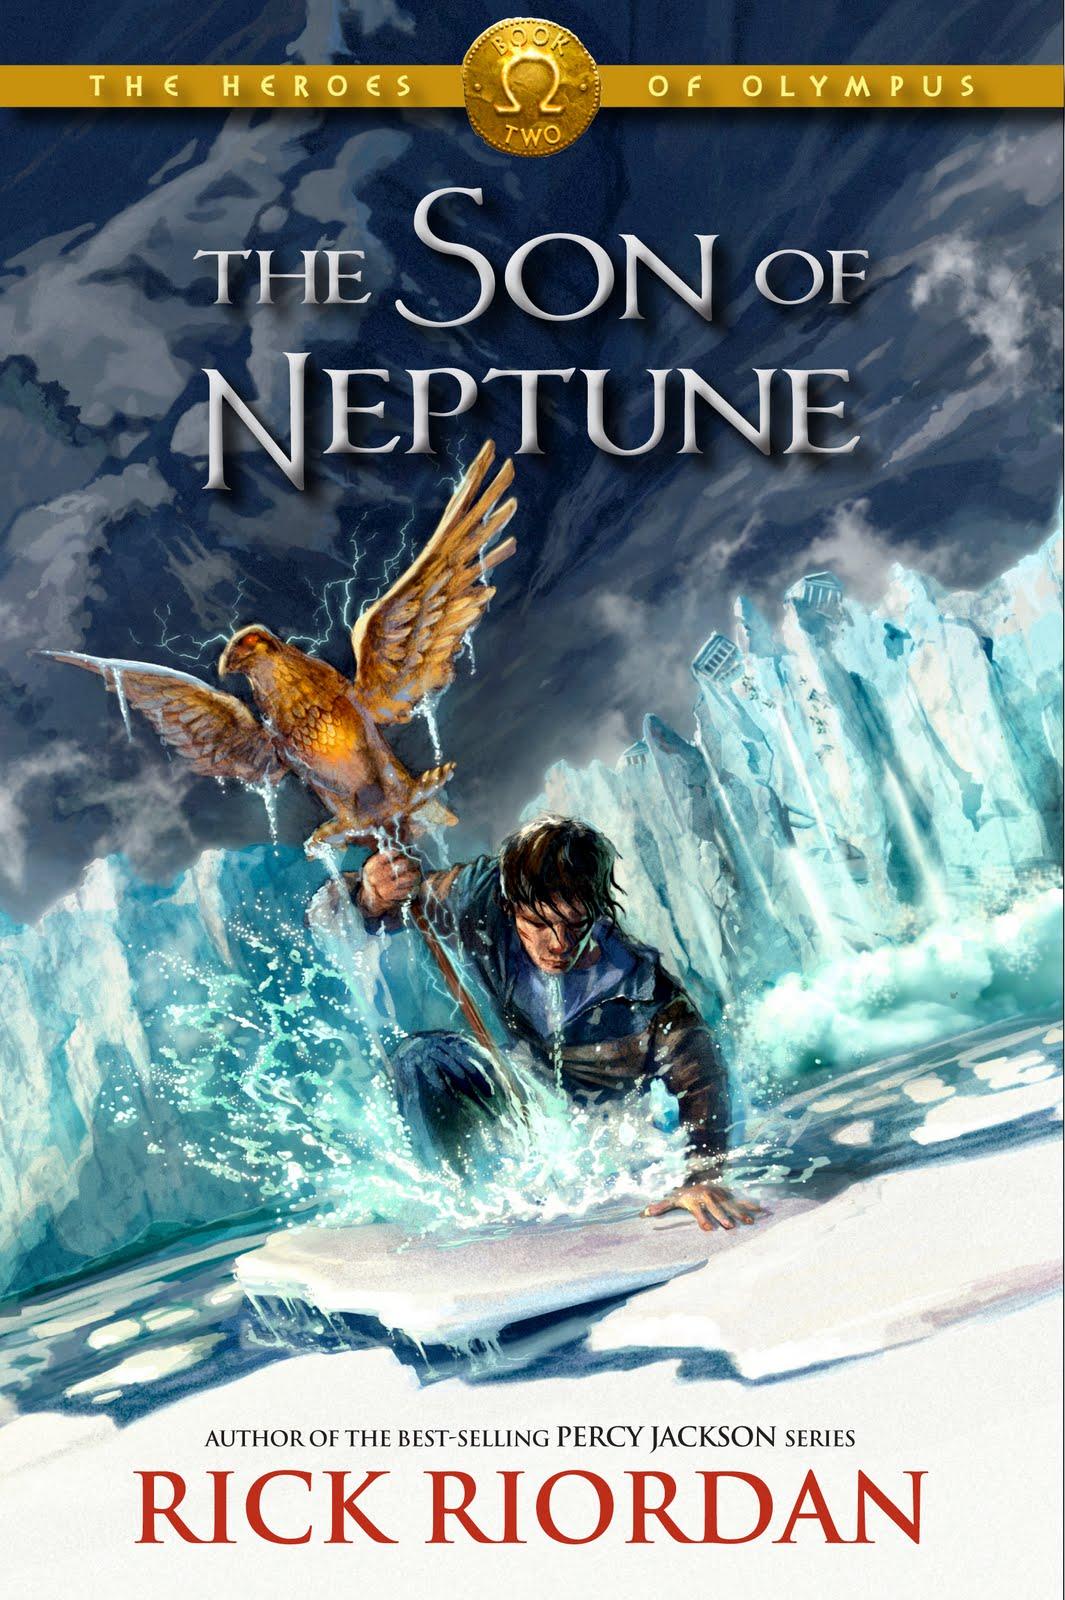 The Son of Neptune | Riordan Wiki | FANDOM powered by Wikia